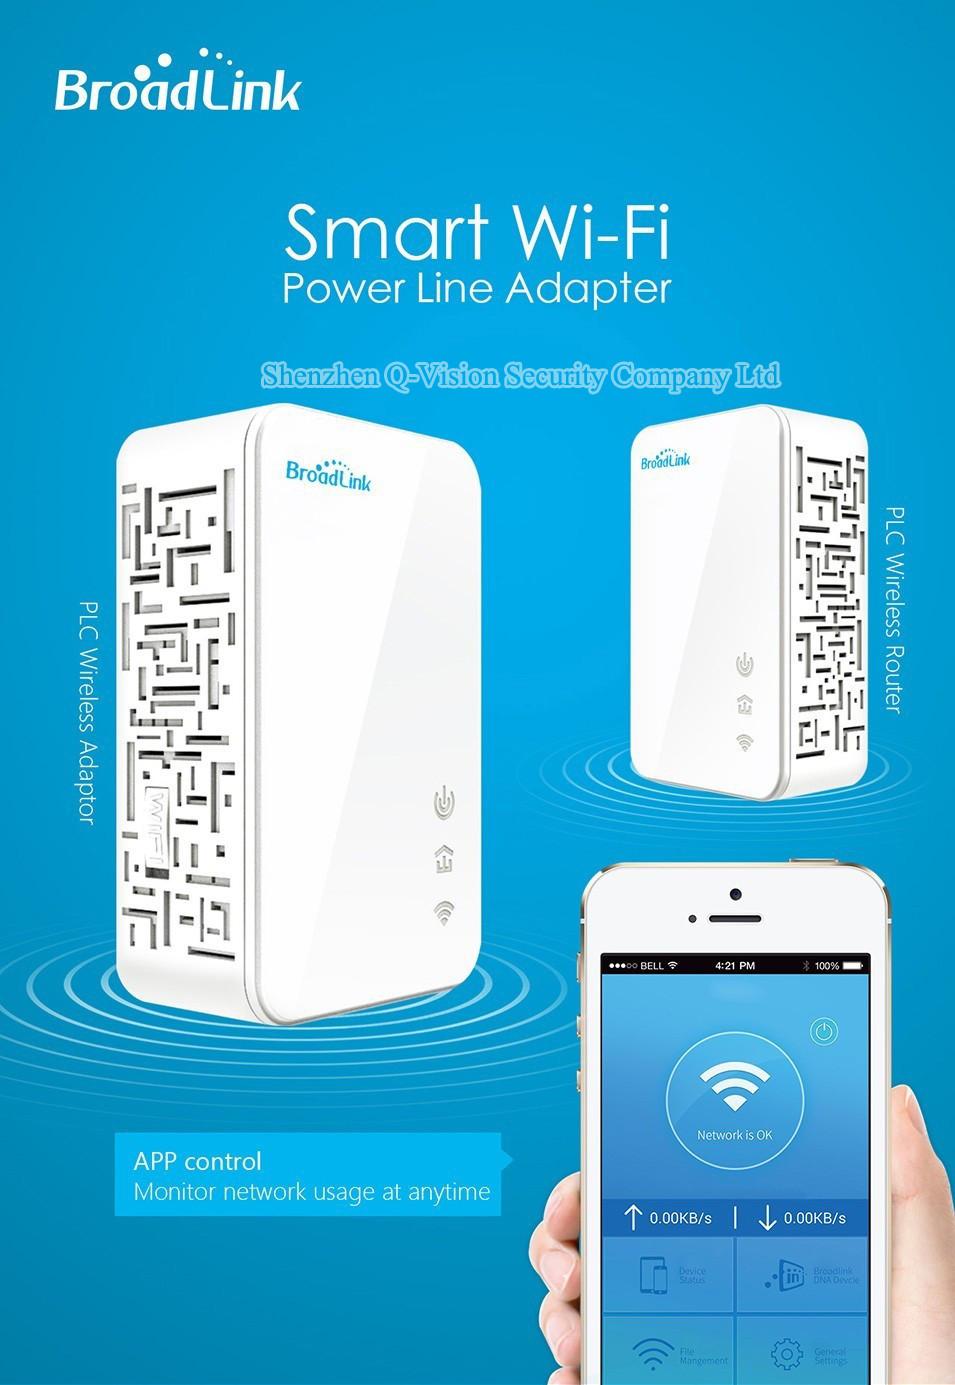 11-UKEUCN Broadlink DNA 200M Wireless WIFI Router Powerline Carrier Extend Wireless Smart Router WIFI Range Extender Automation